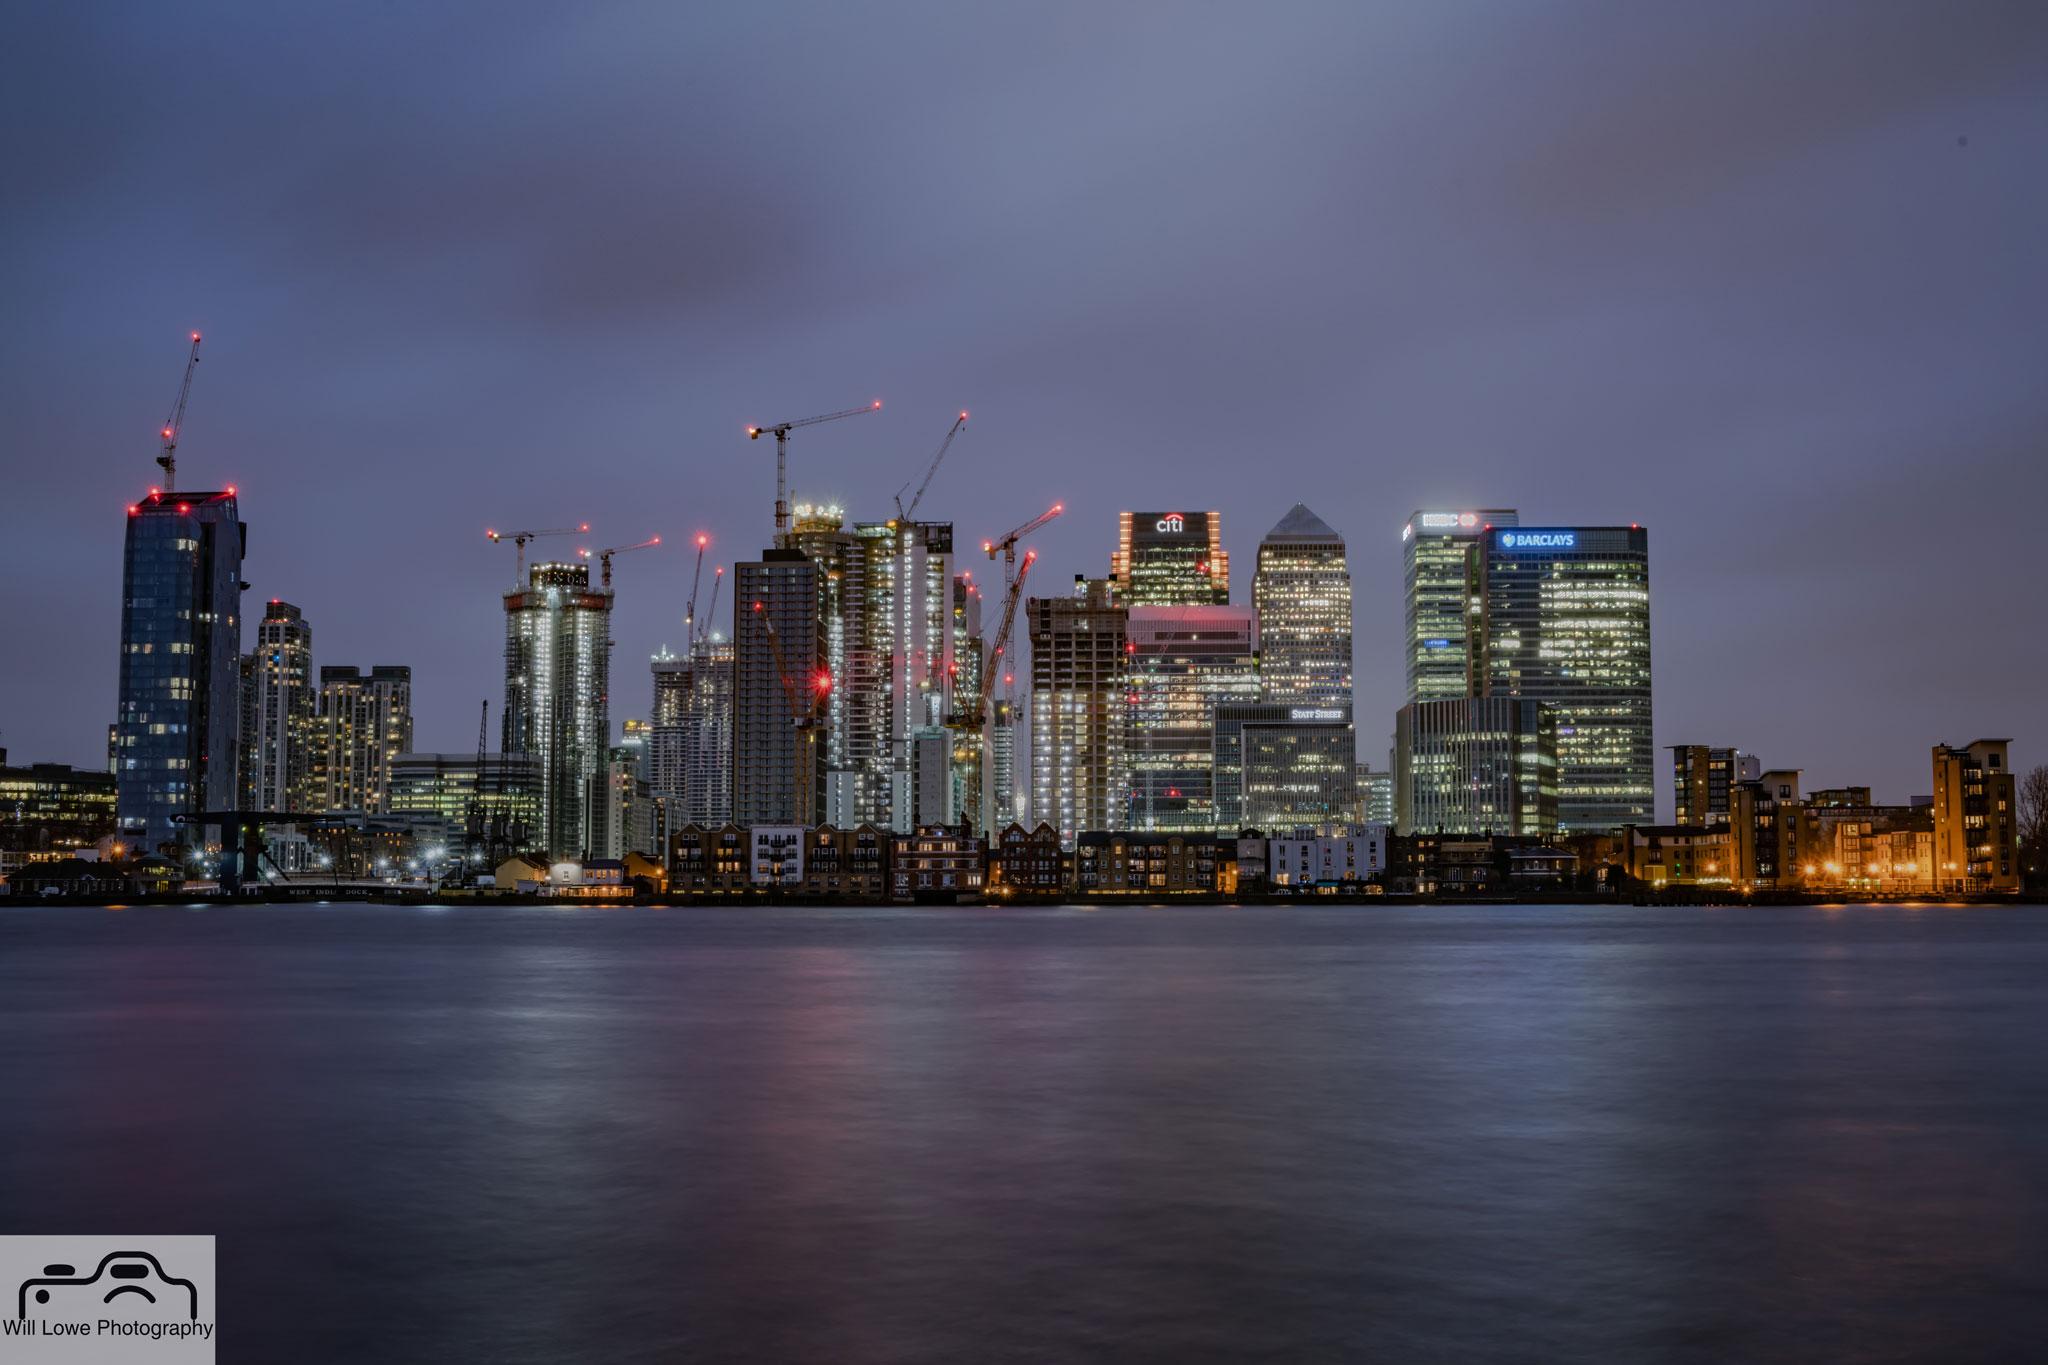 Canary Wharf - London